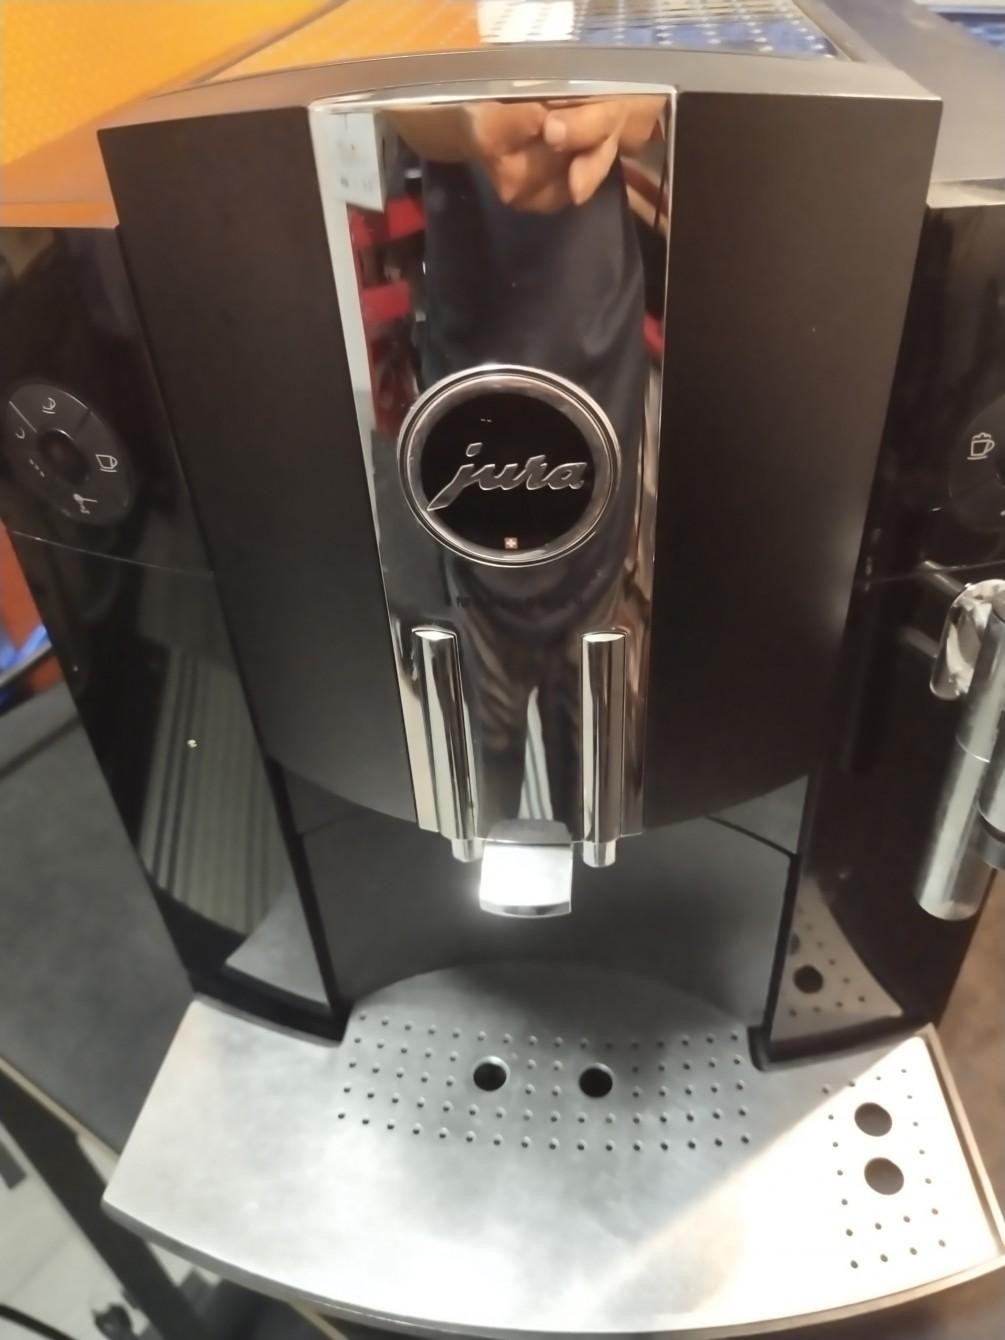 jura-c9 全自動咖啡維修-不出咖啡無法下粉維修